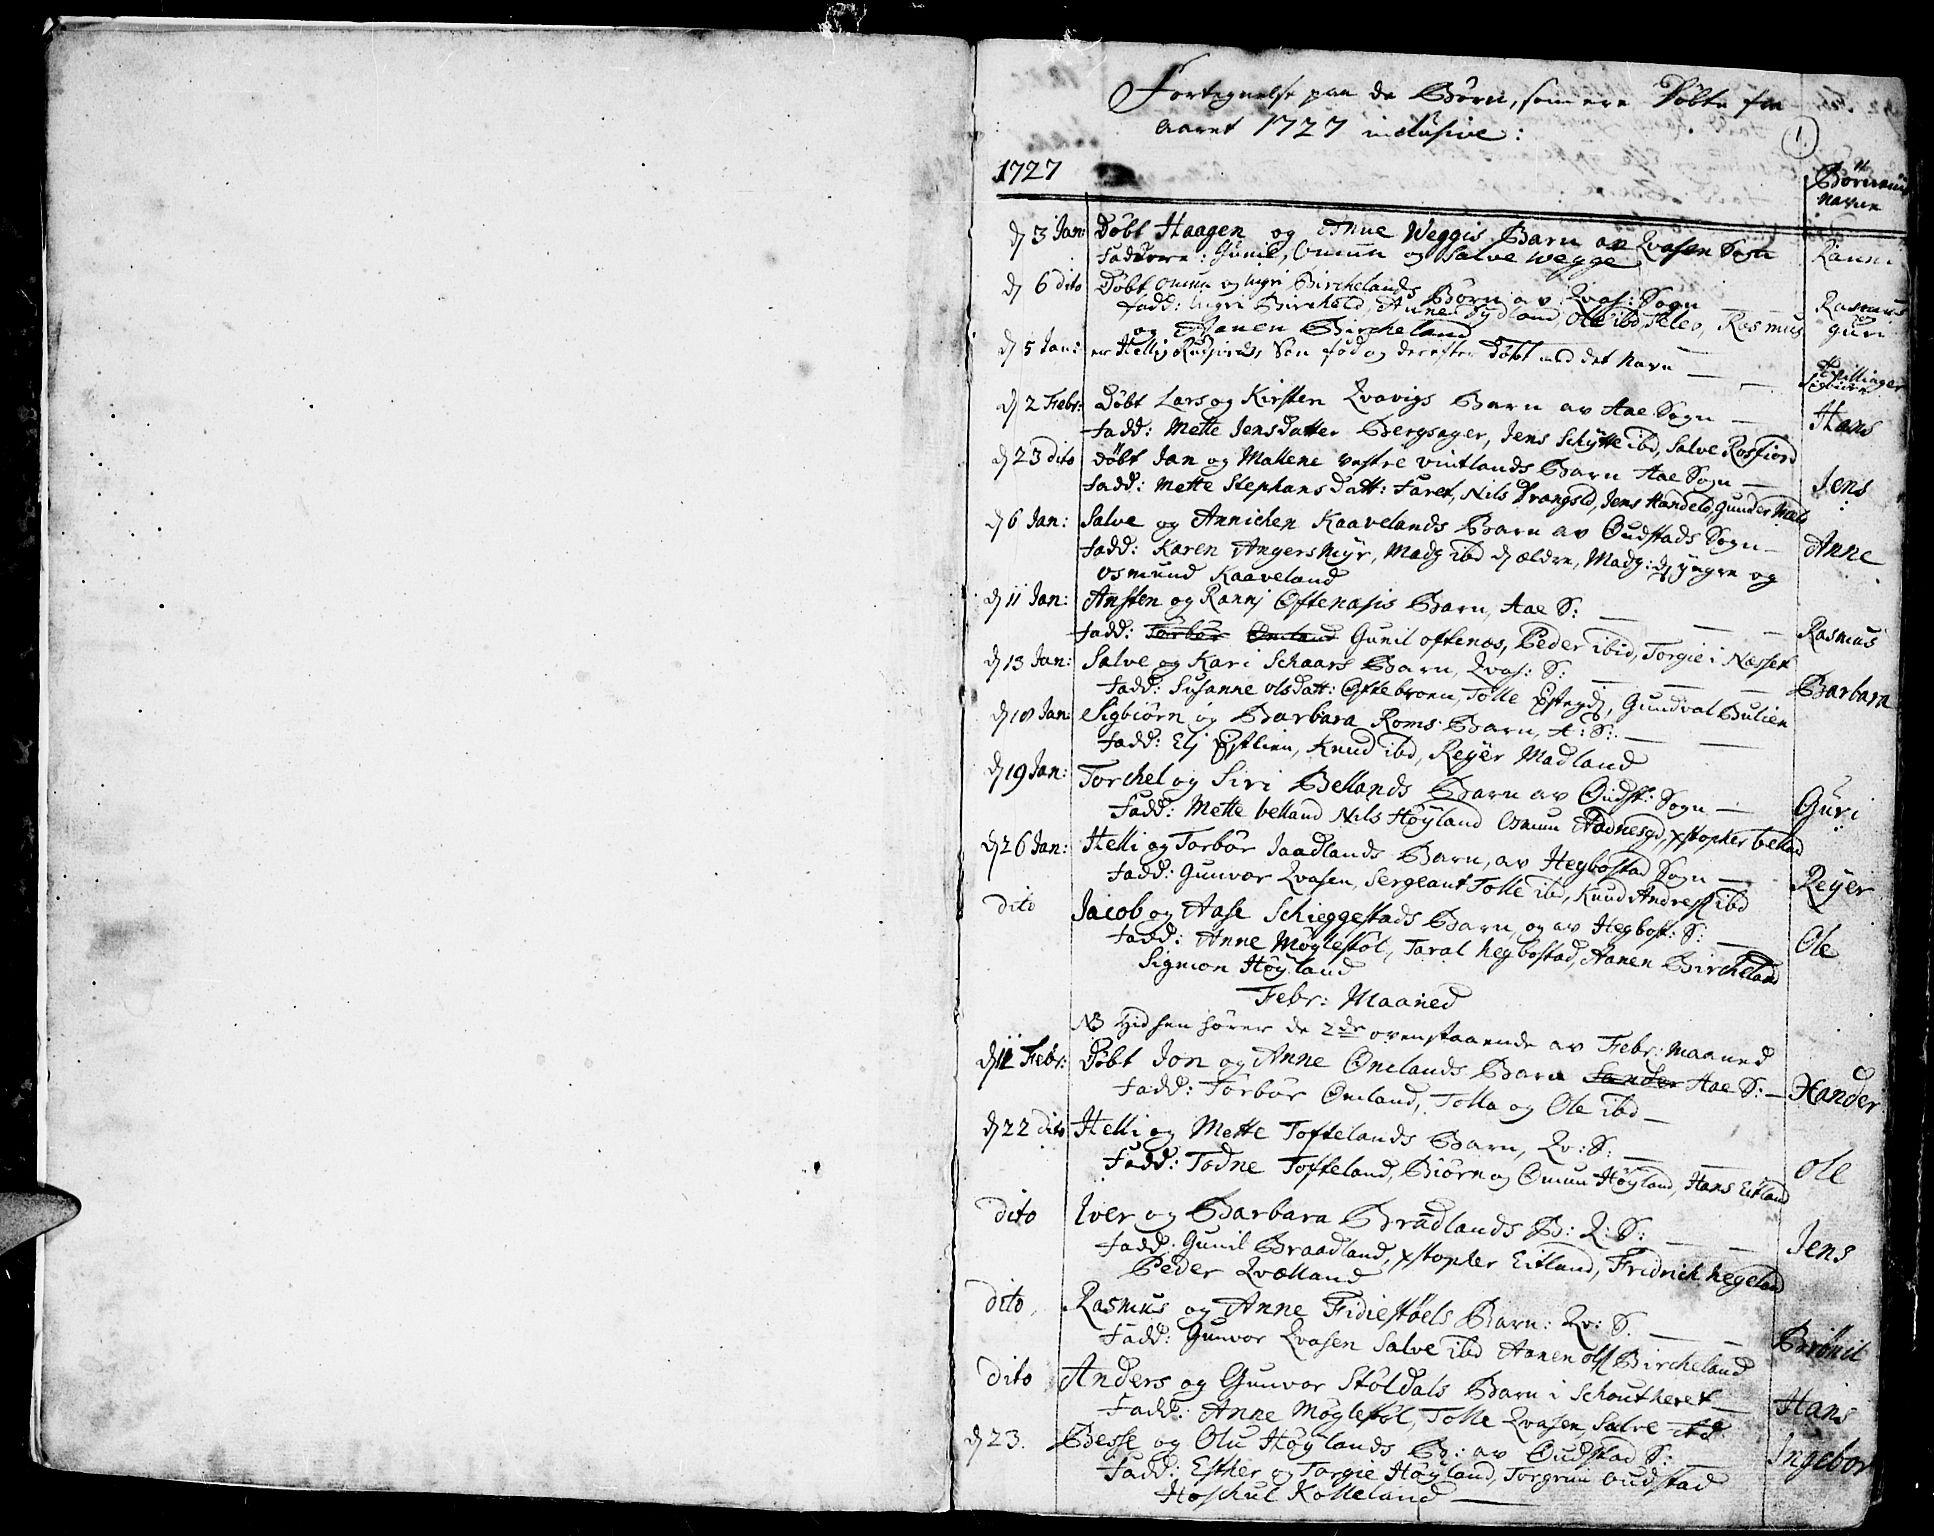 SAK, Lyngdal sokneprestkontor, F/Fa/Fac/L0001: Ministerialbok nr. A 1, 1727-1779, s. 1